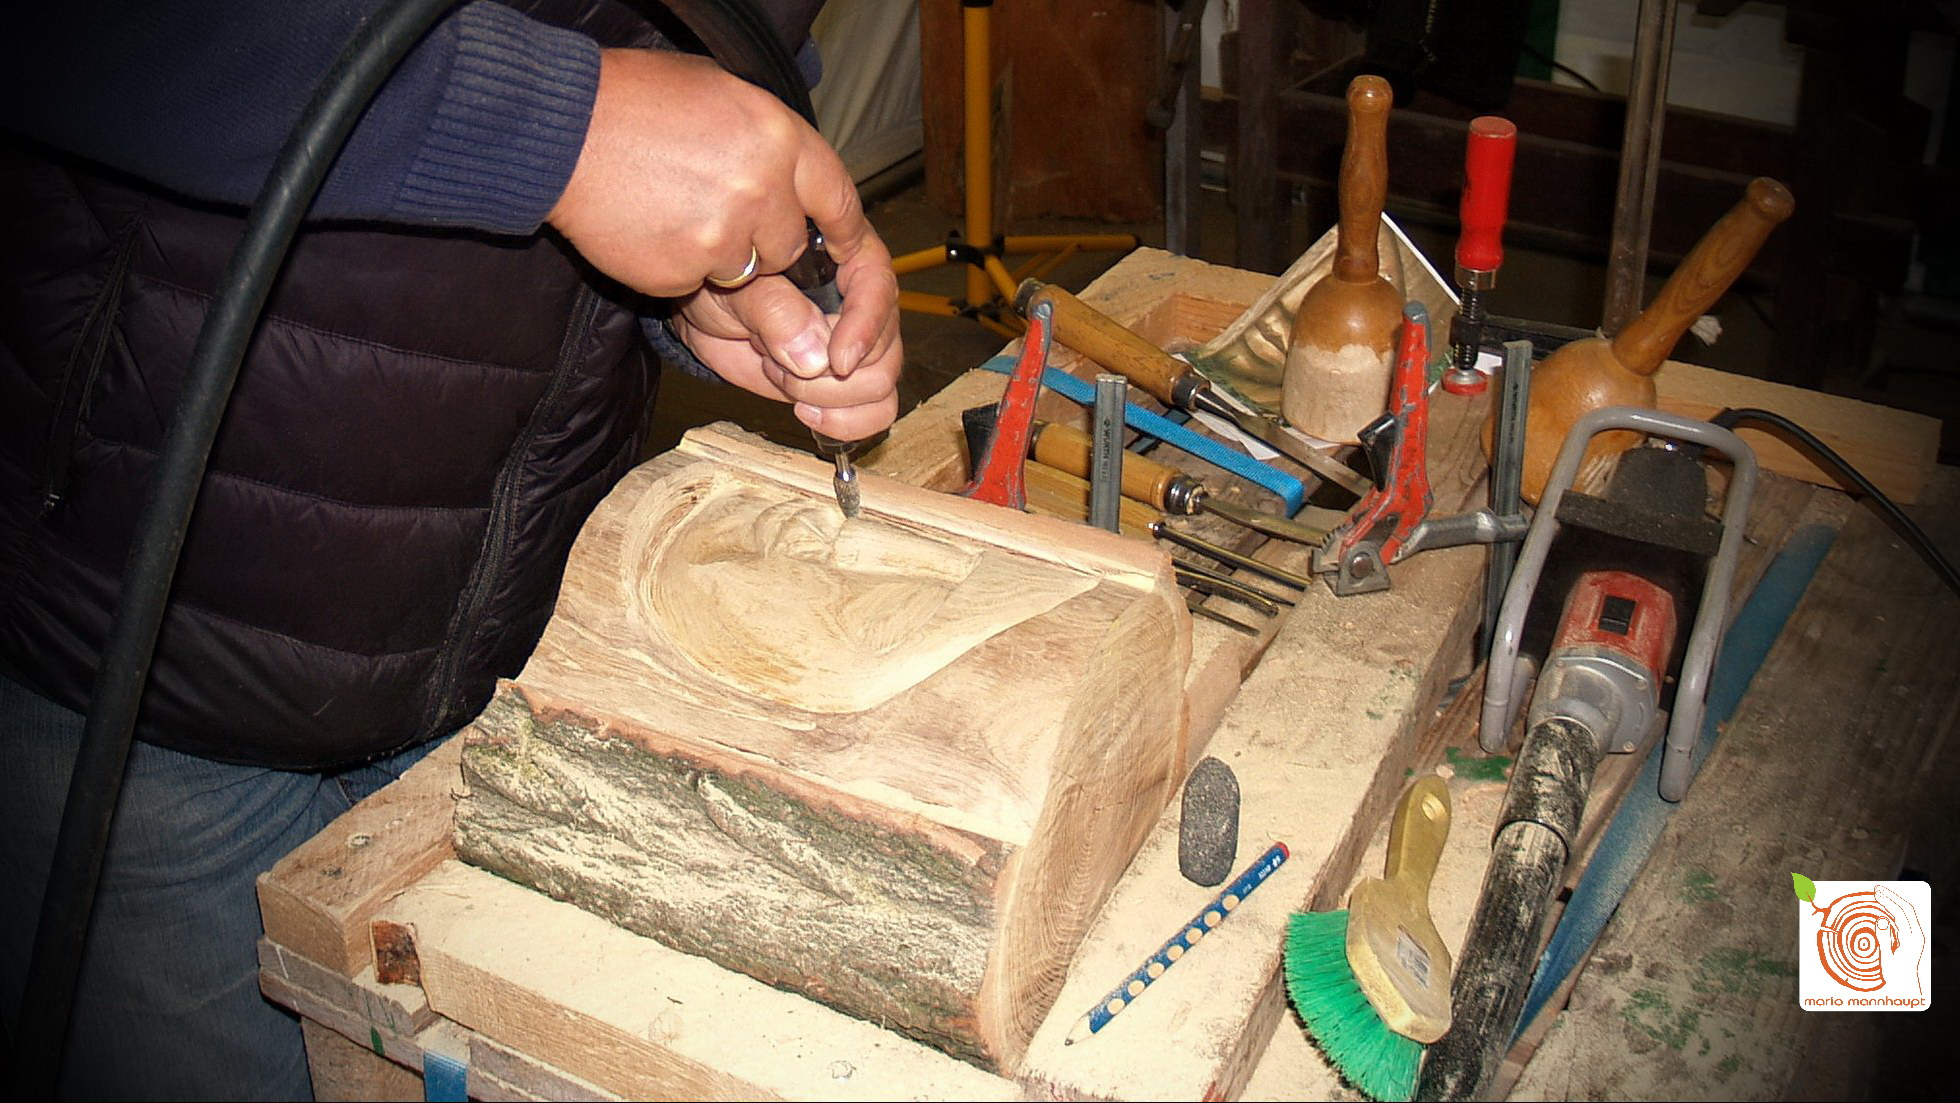 Holz - Relief selber machen